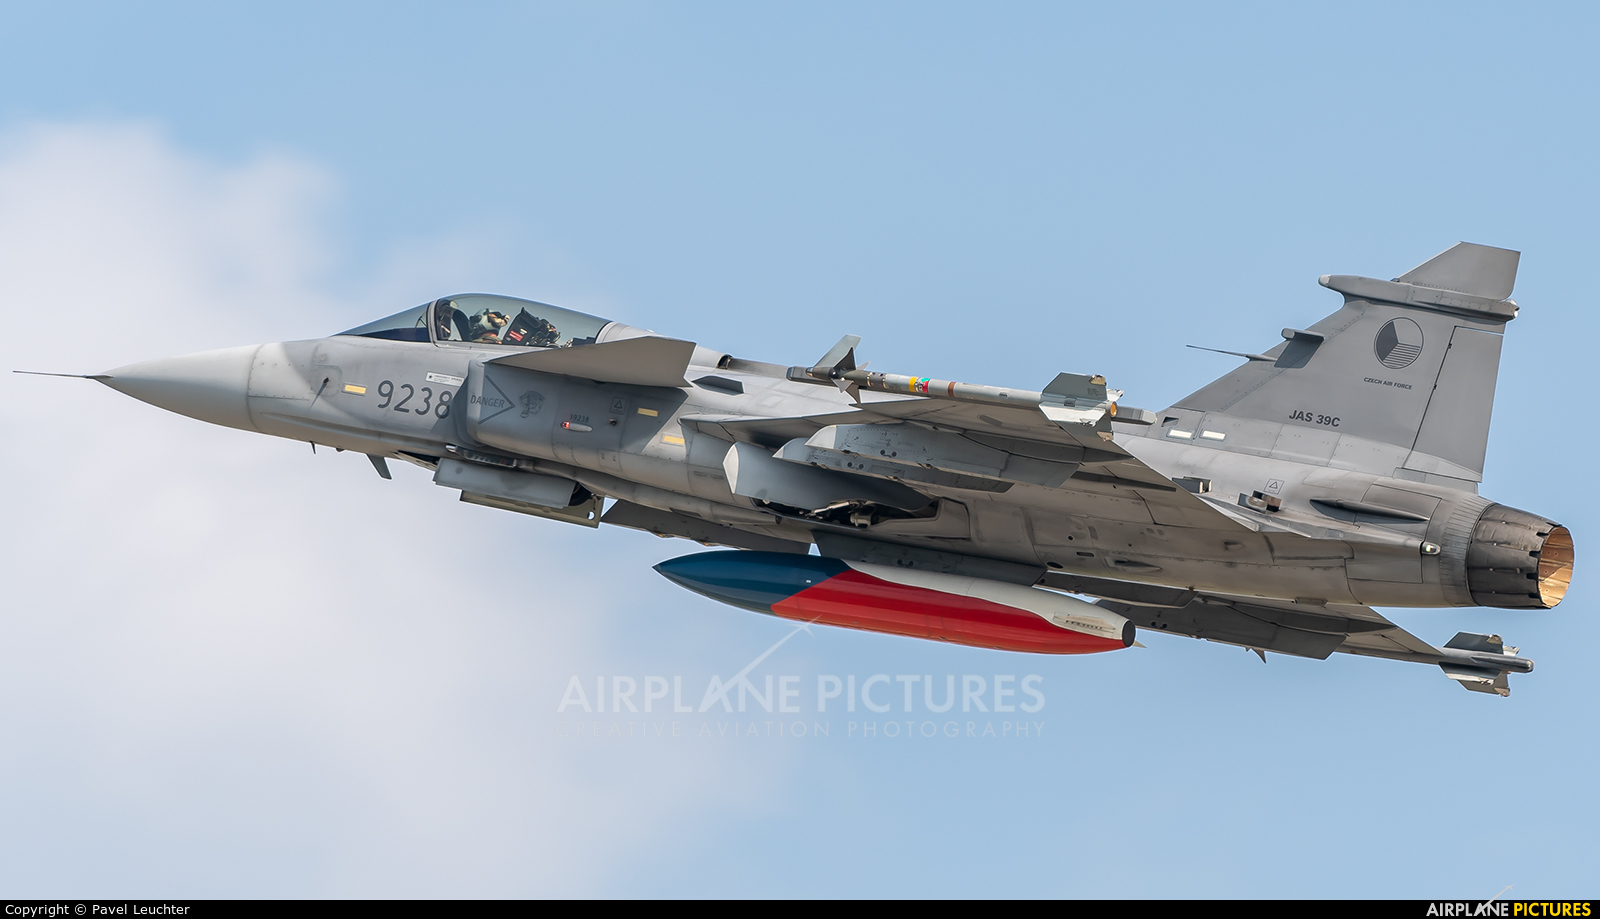 Czech - Air Force 9238 aircraft at Pardubice